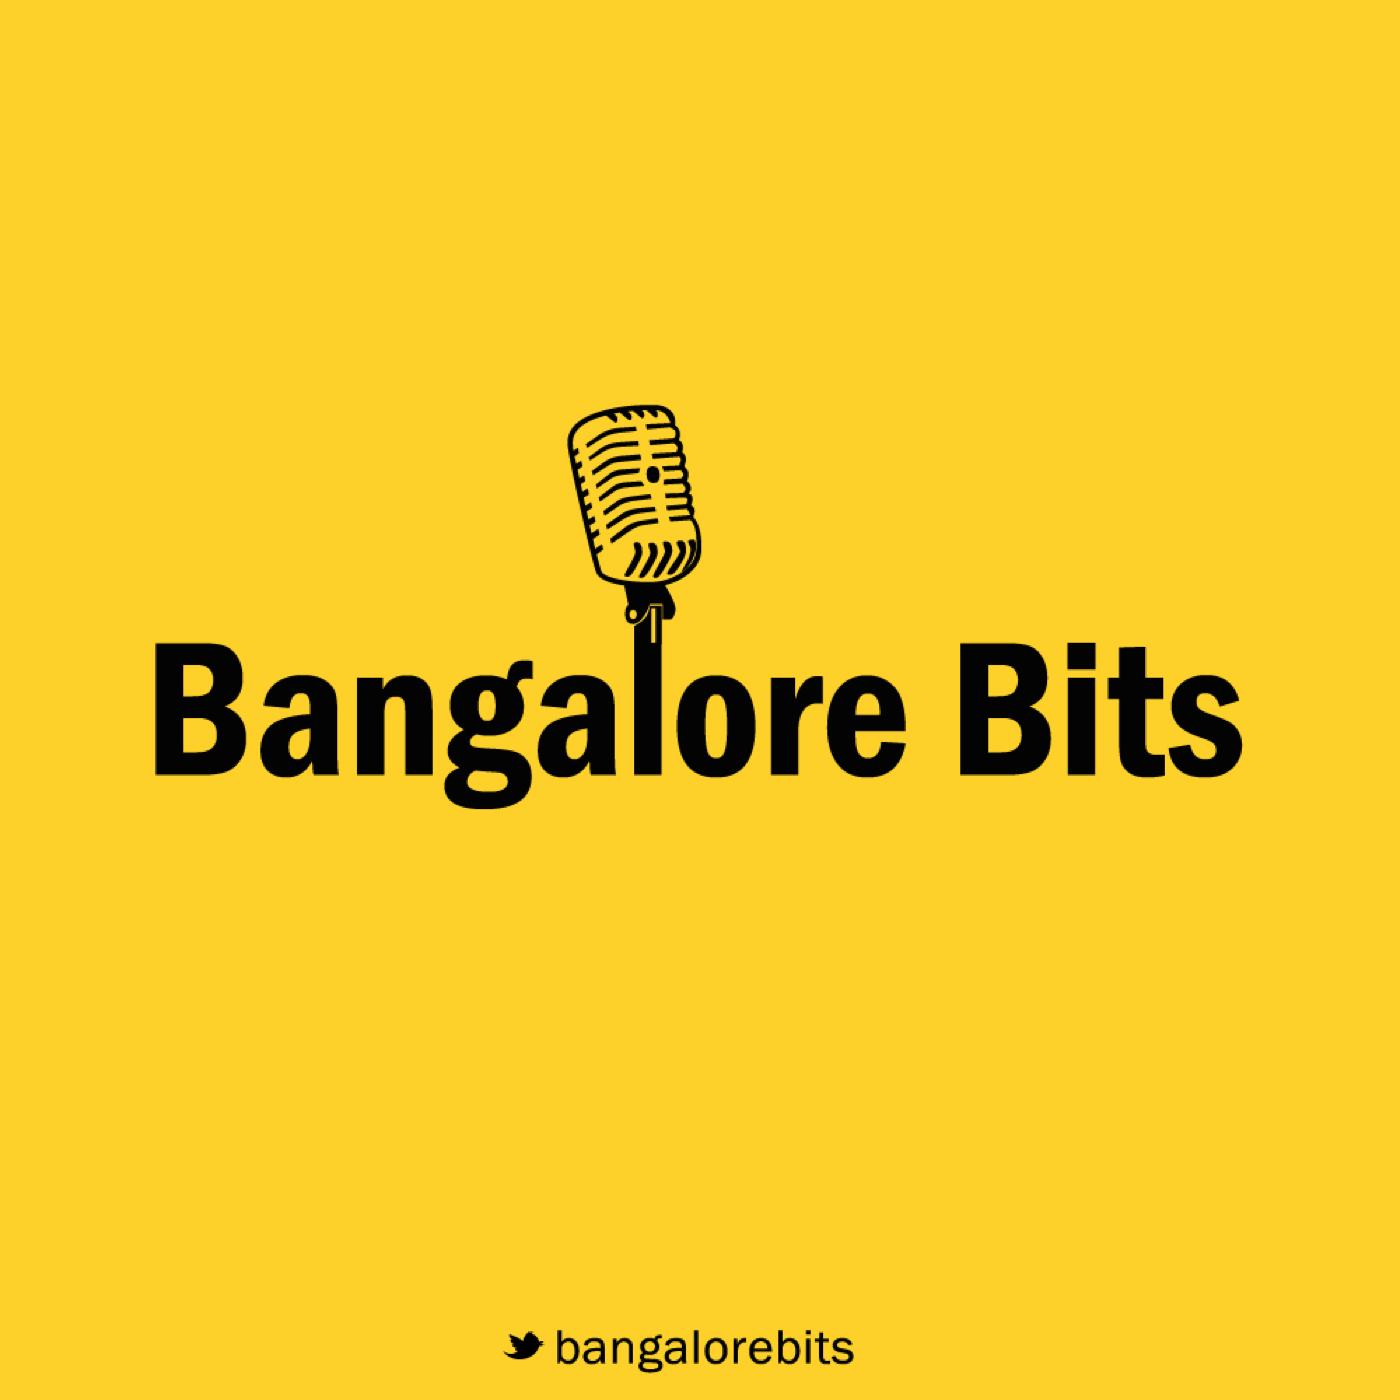 The Bangalore Bits